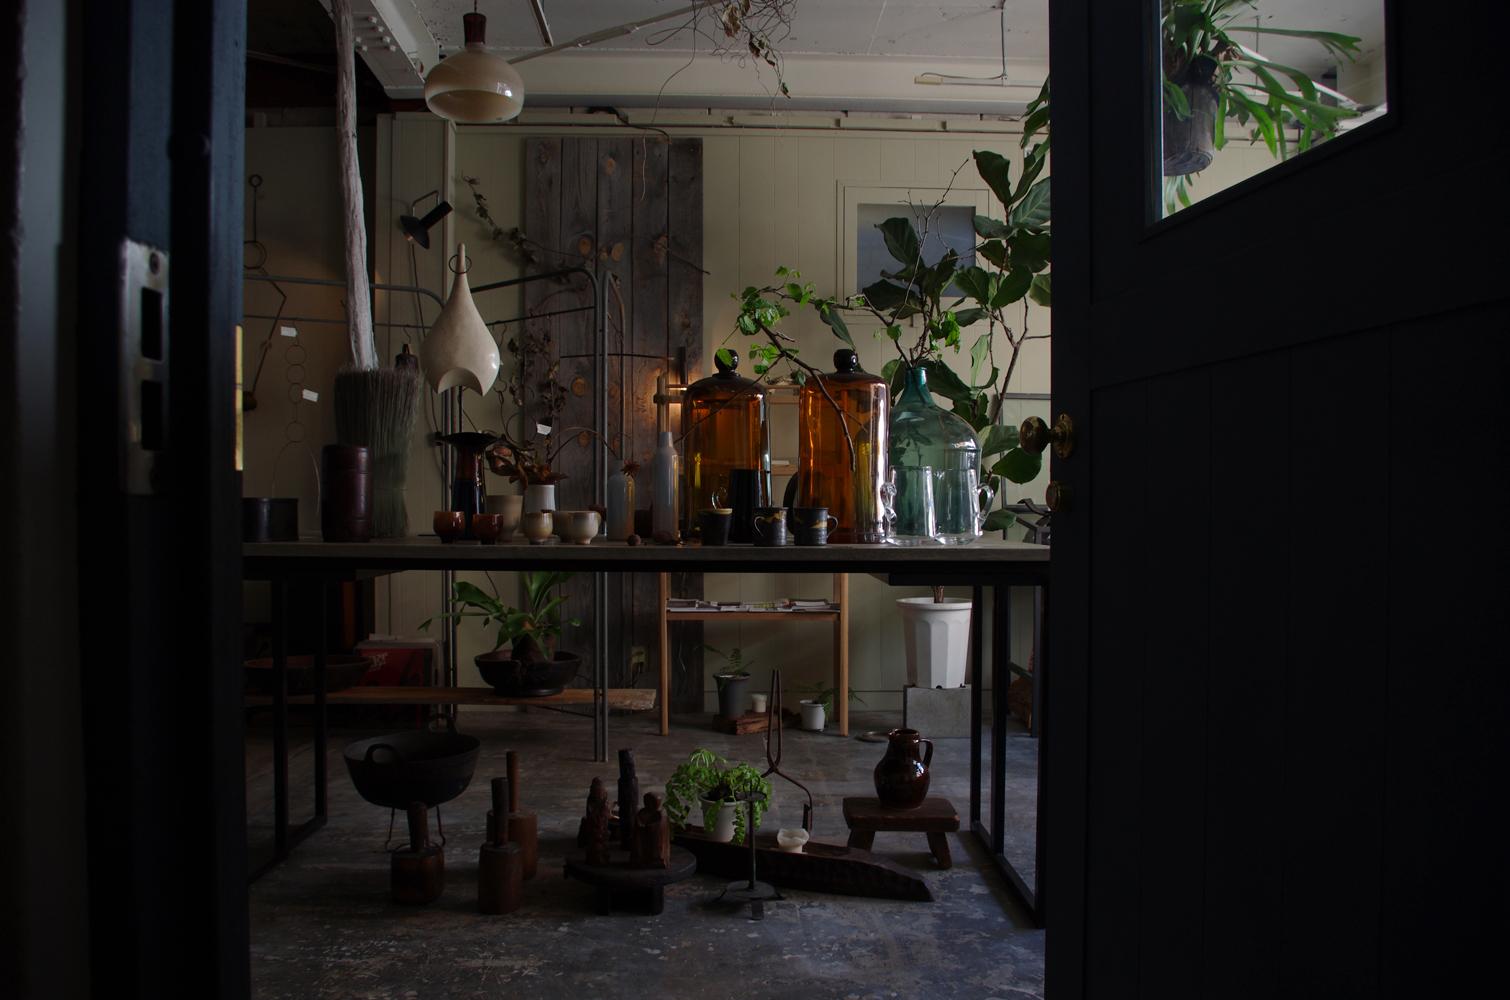 tipura-studio-ironworks-exhibition-35